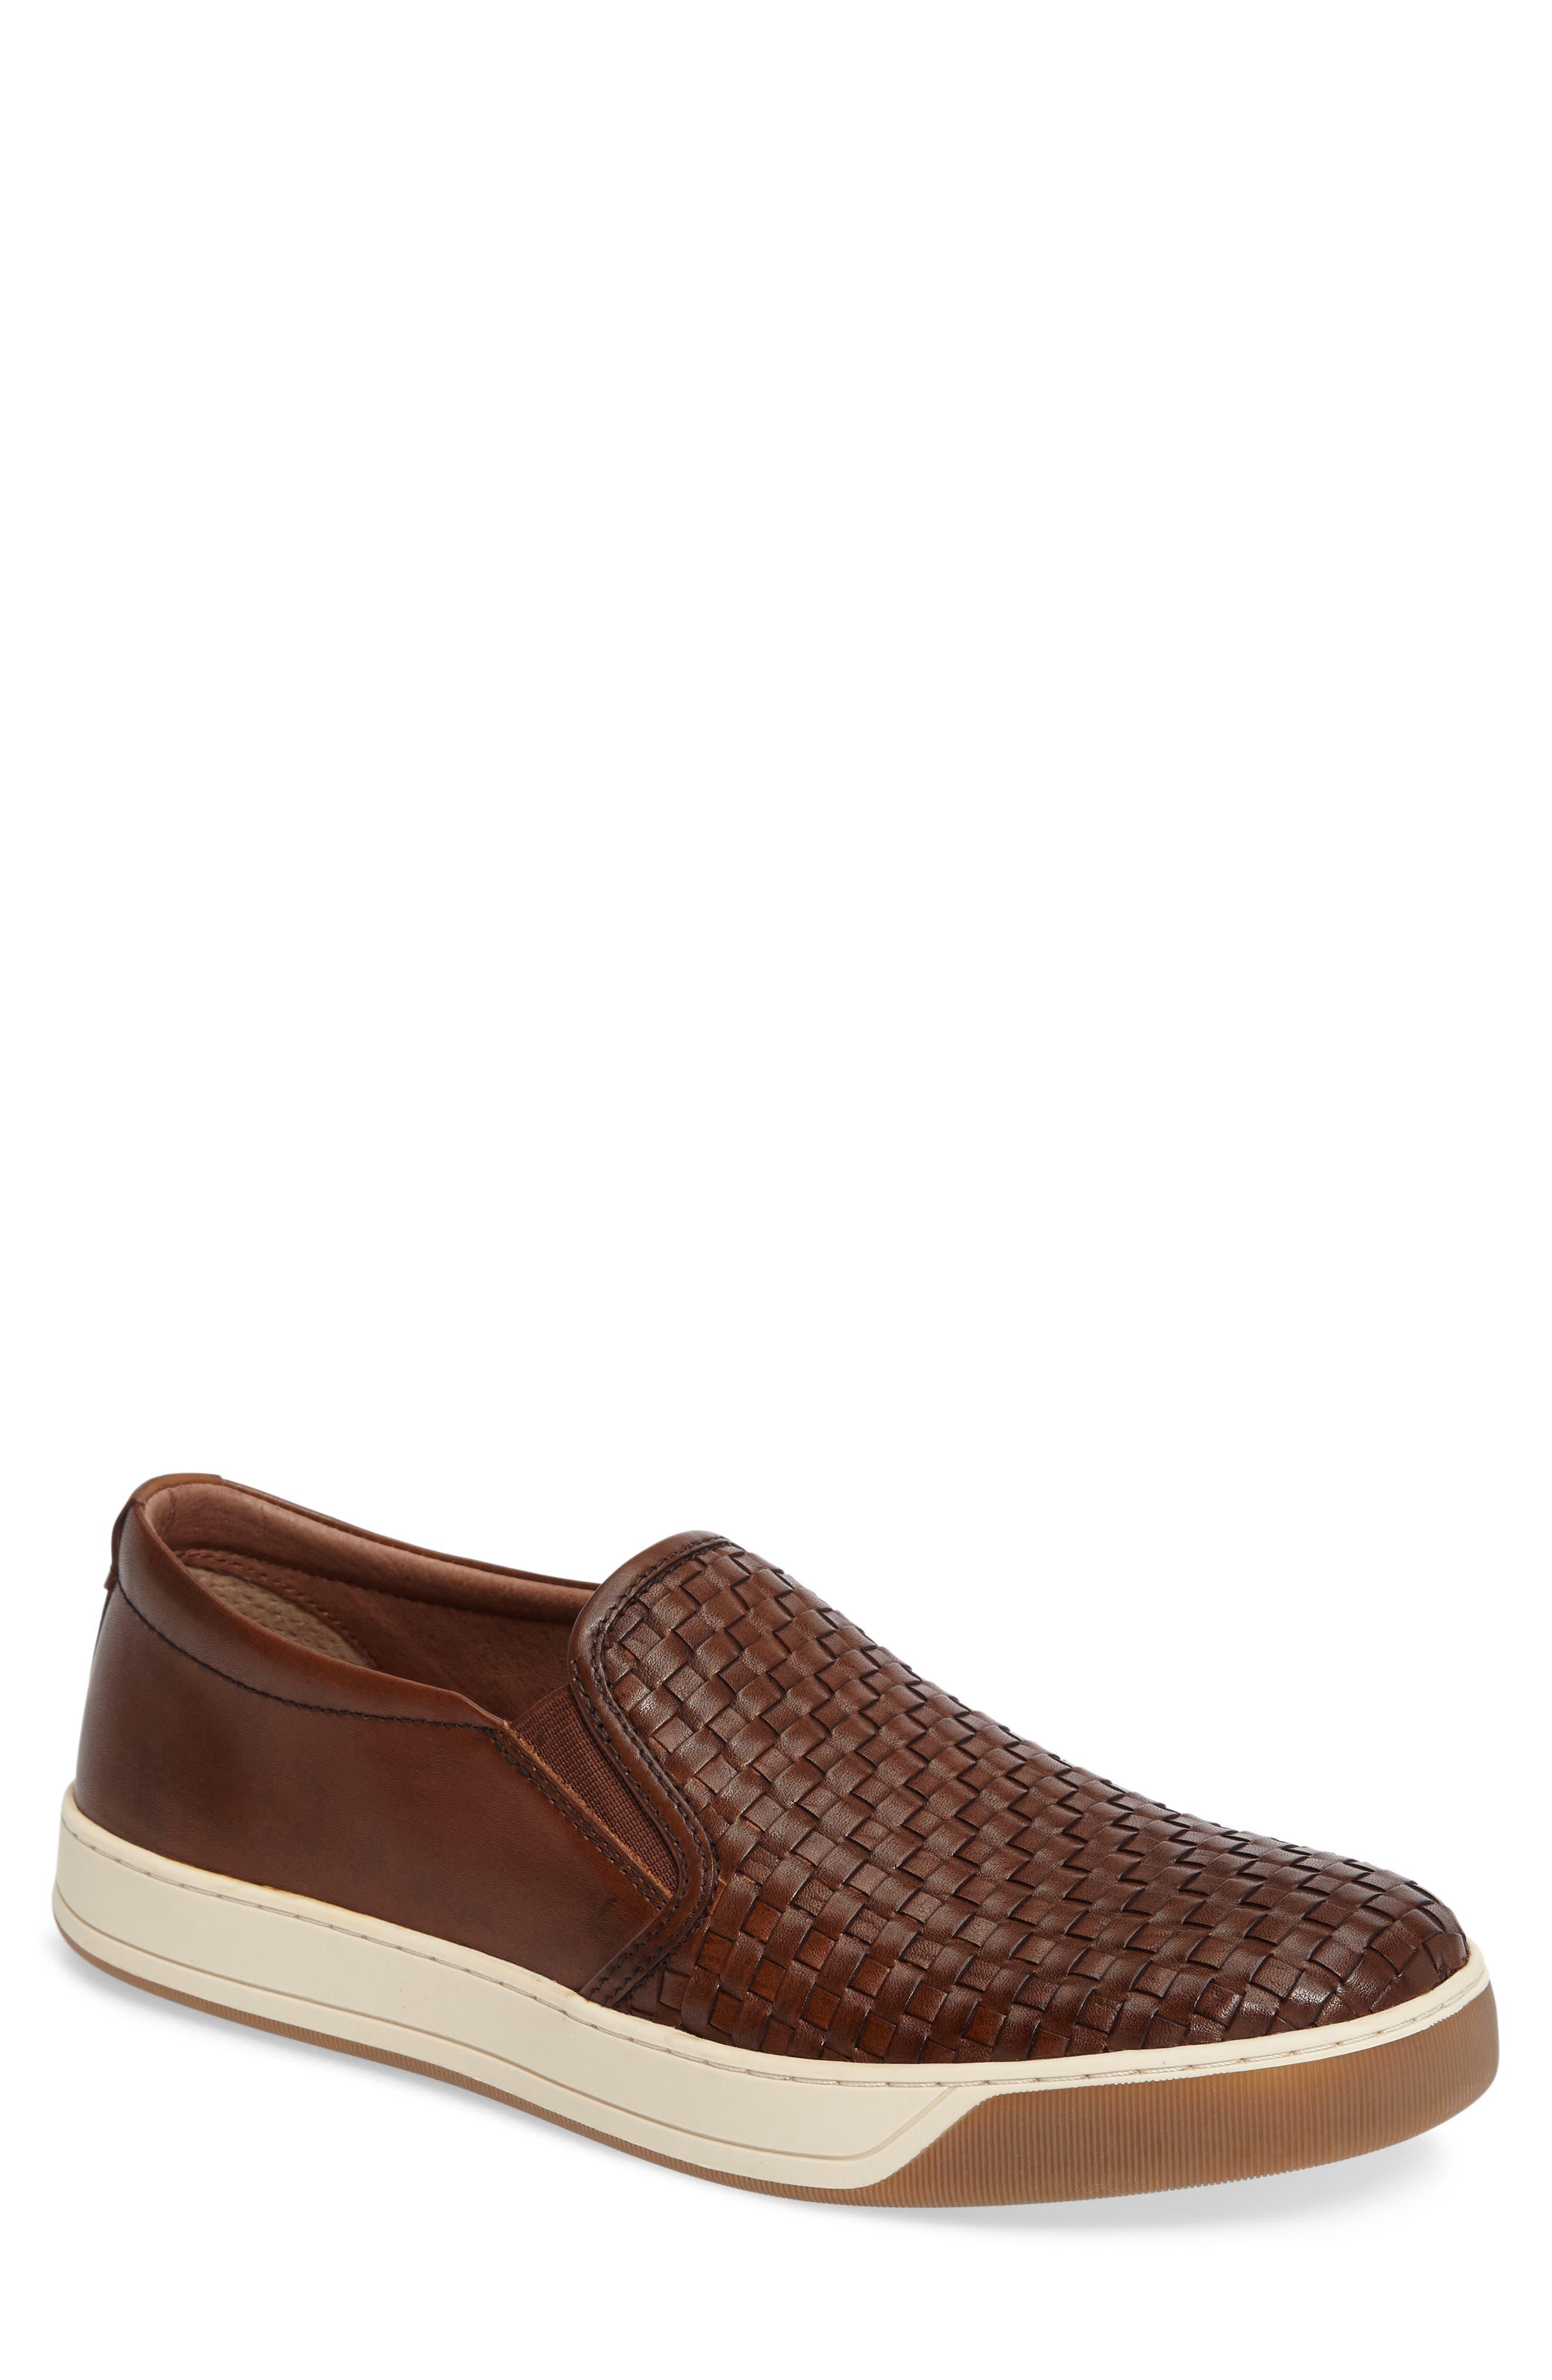 J&M 1850 Allister Slip-On Sneaker, Main, color, TAN LEATHER